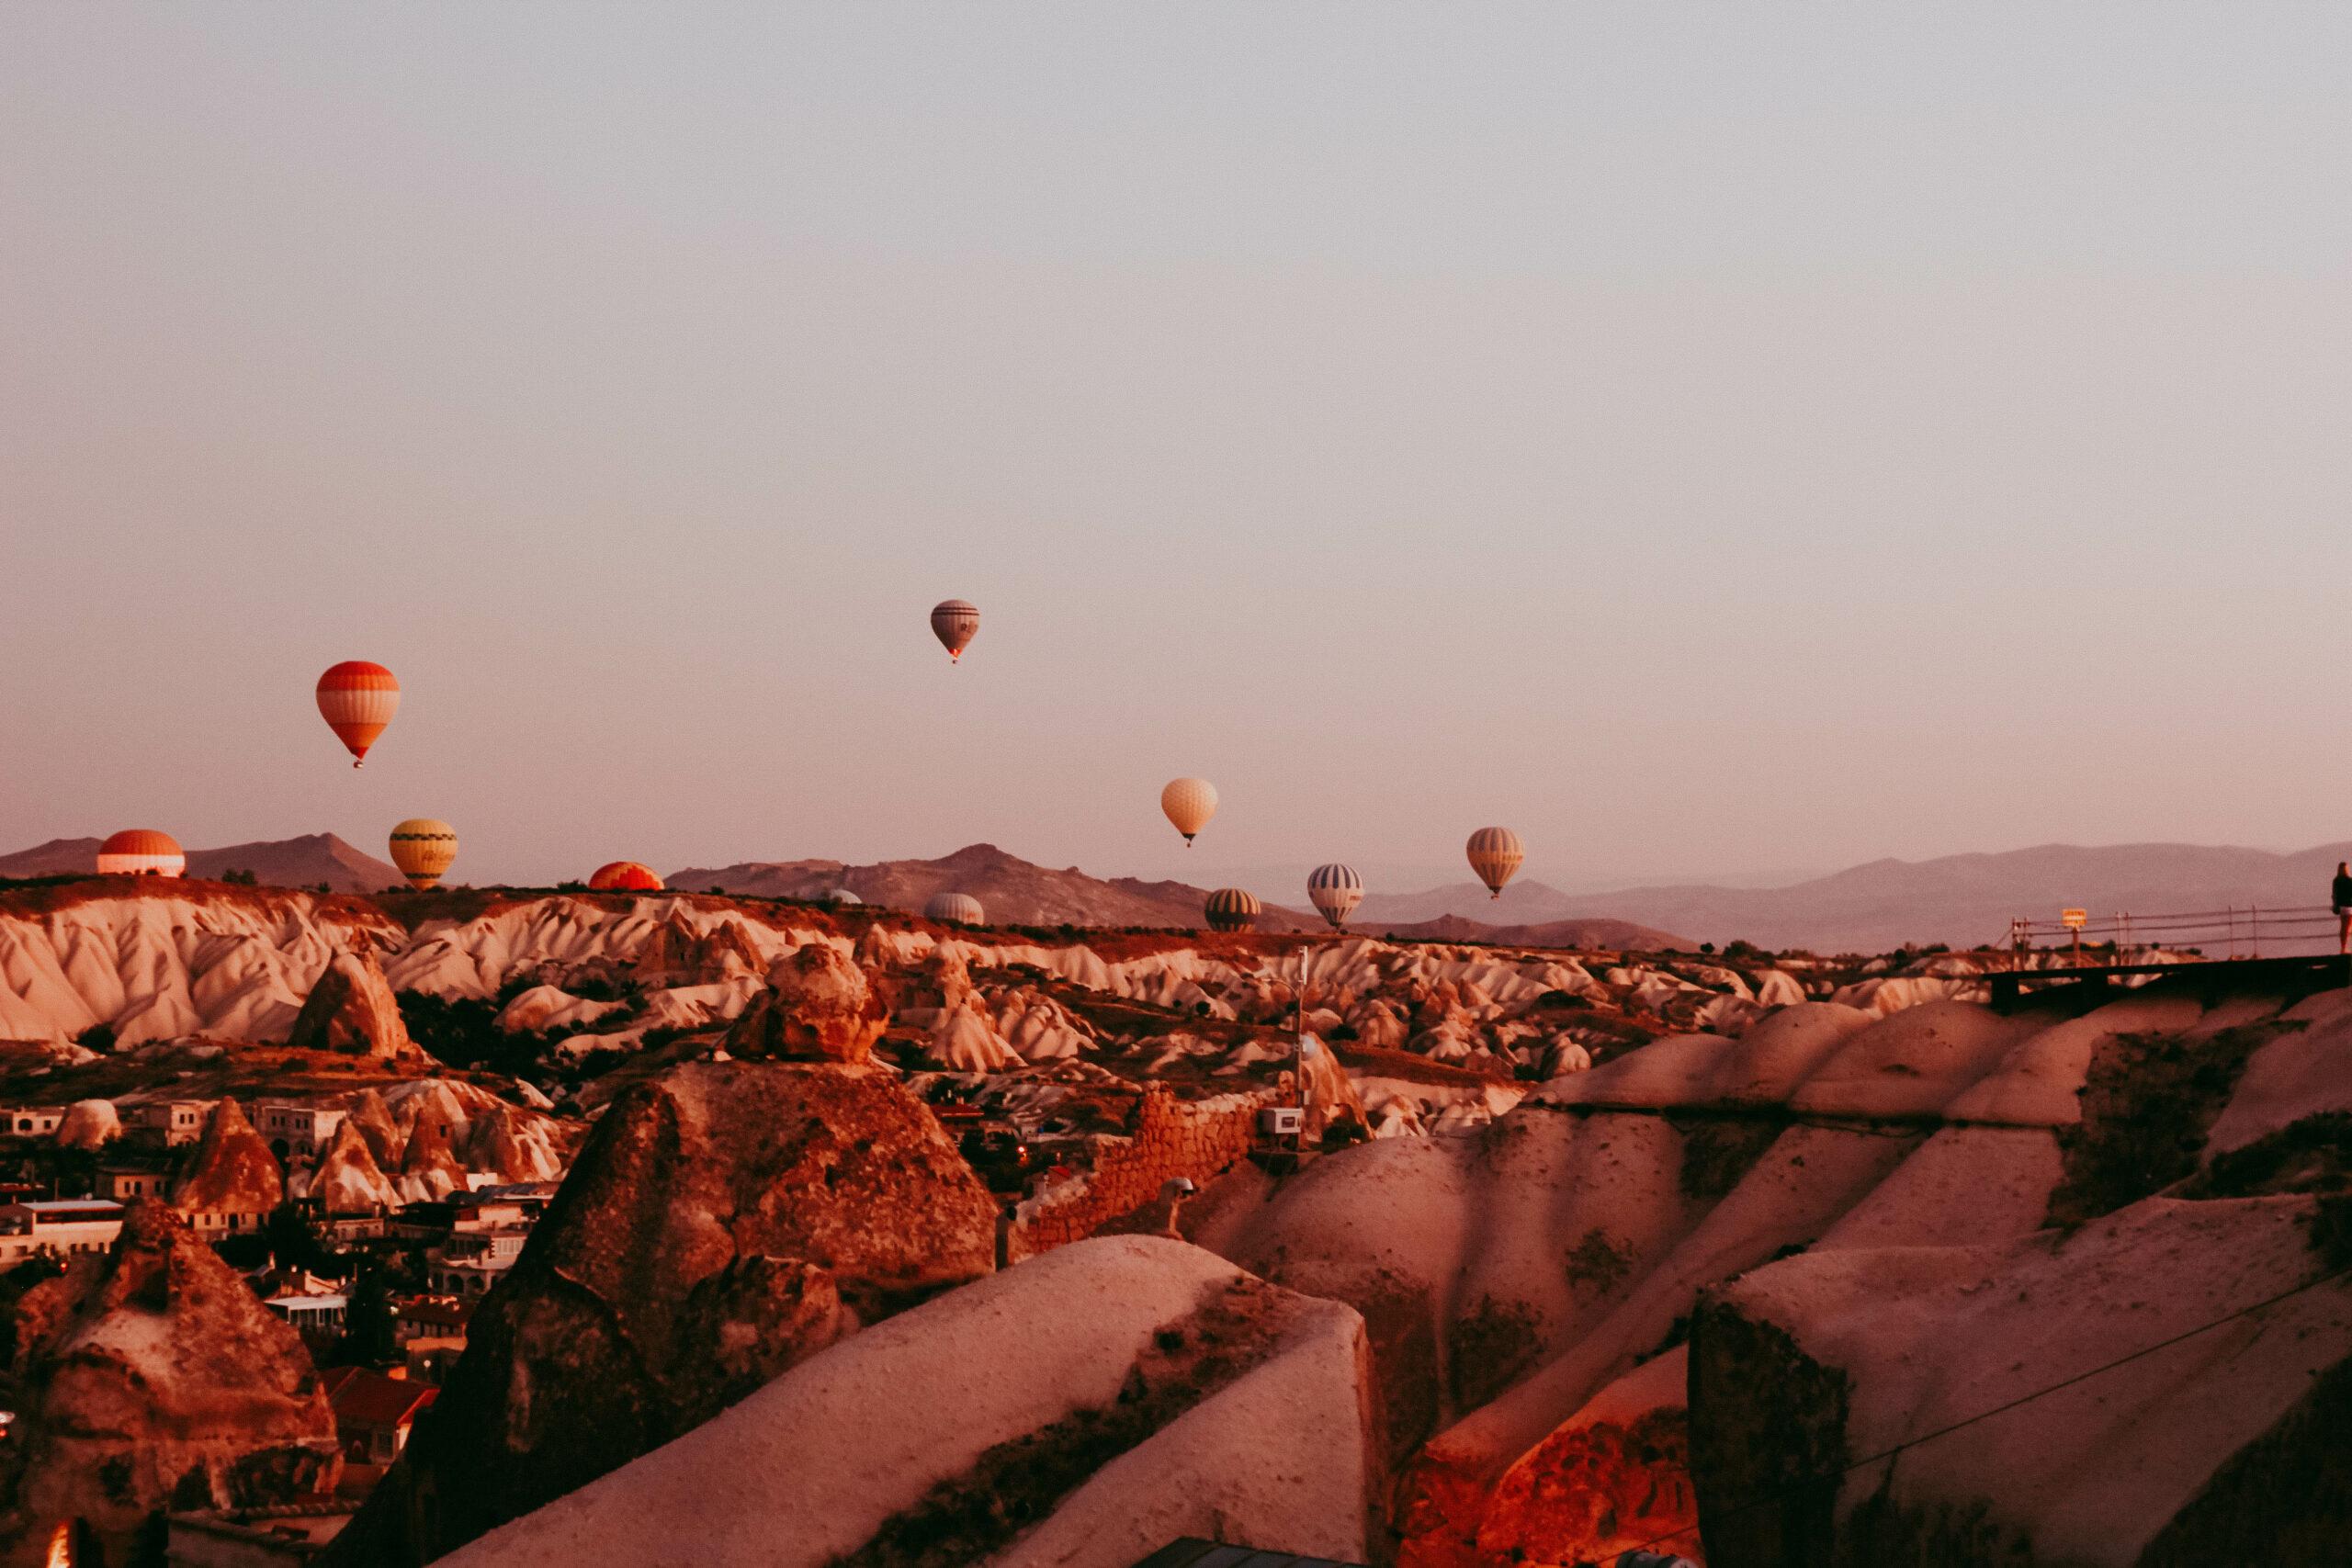 vozdushnie-shari-v-kappadokii